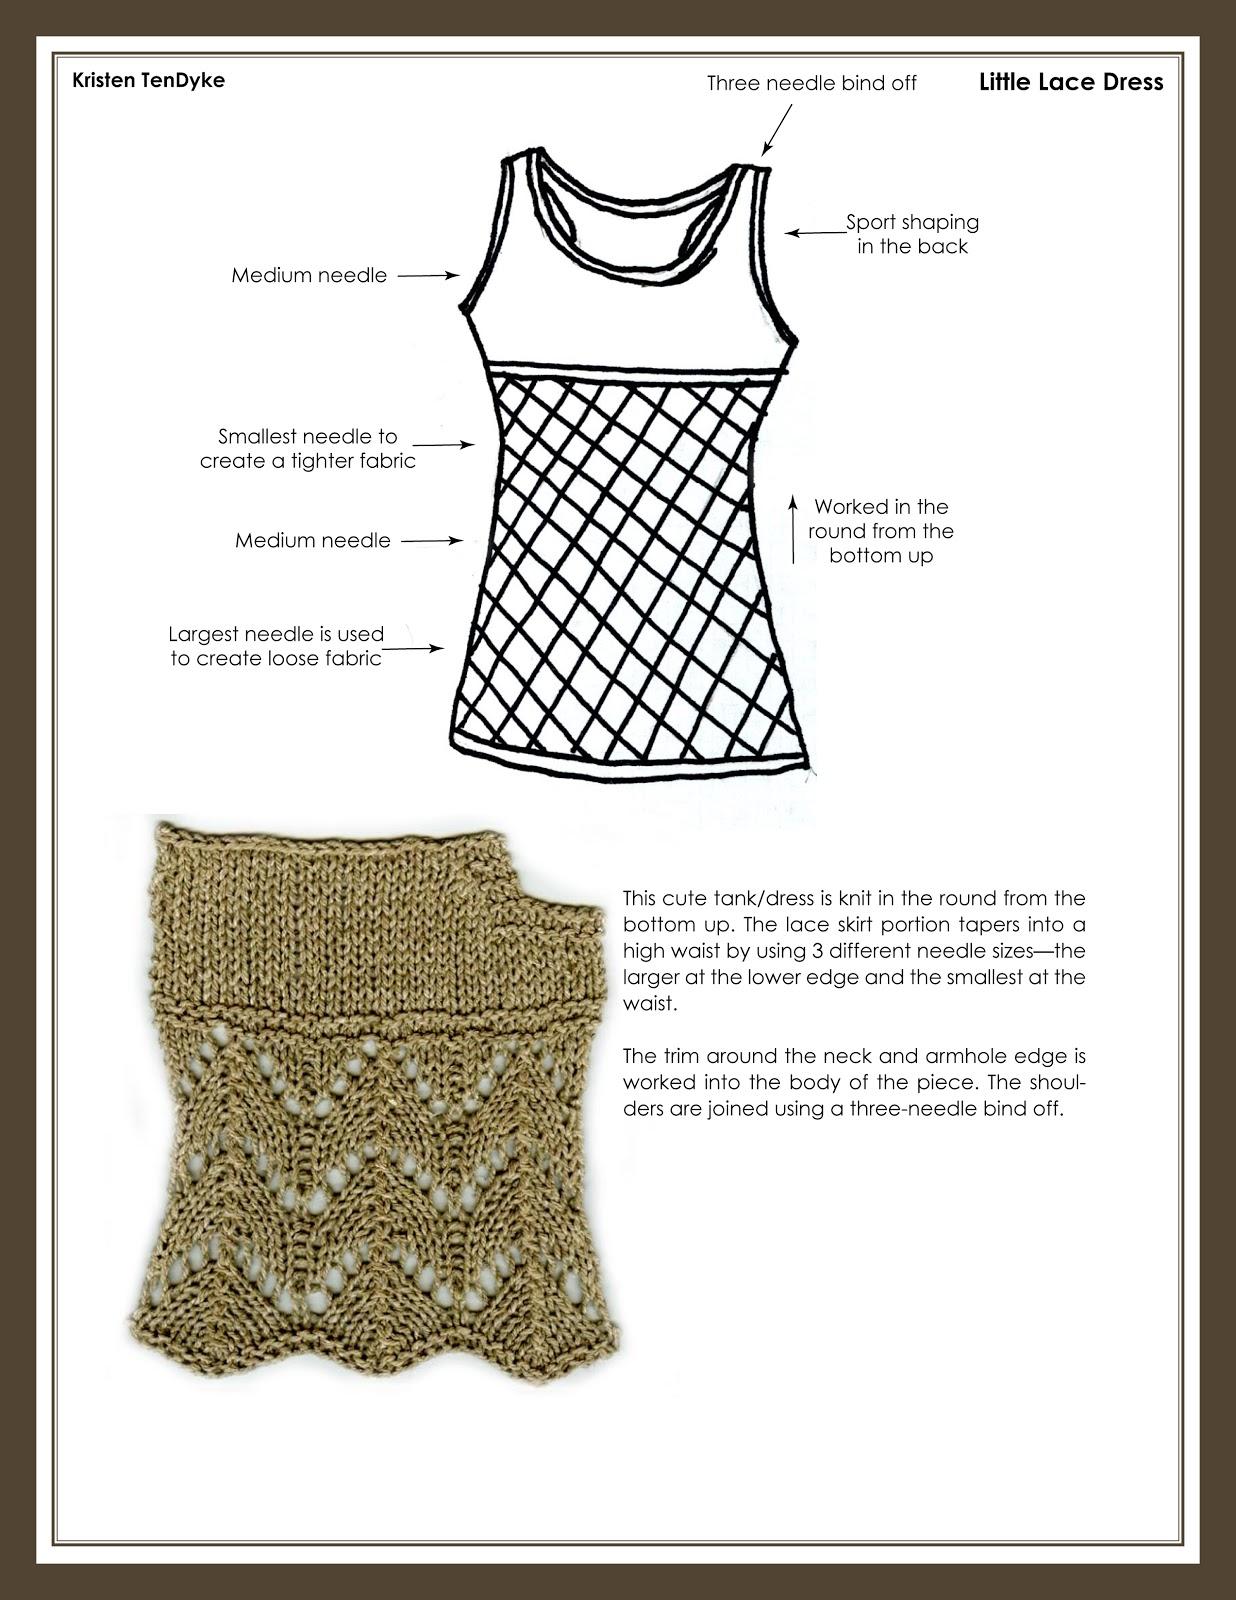 Kristen TenDyke\'s Blog: Finish-Free Knits — Harmony Dress